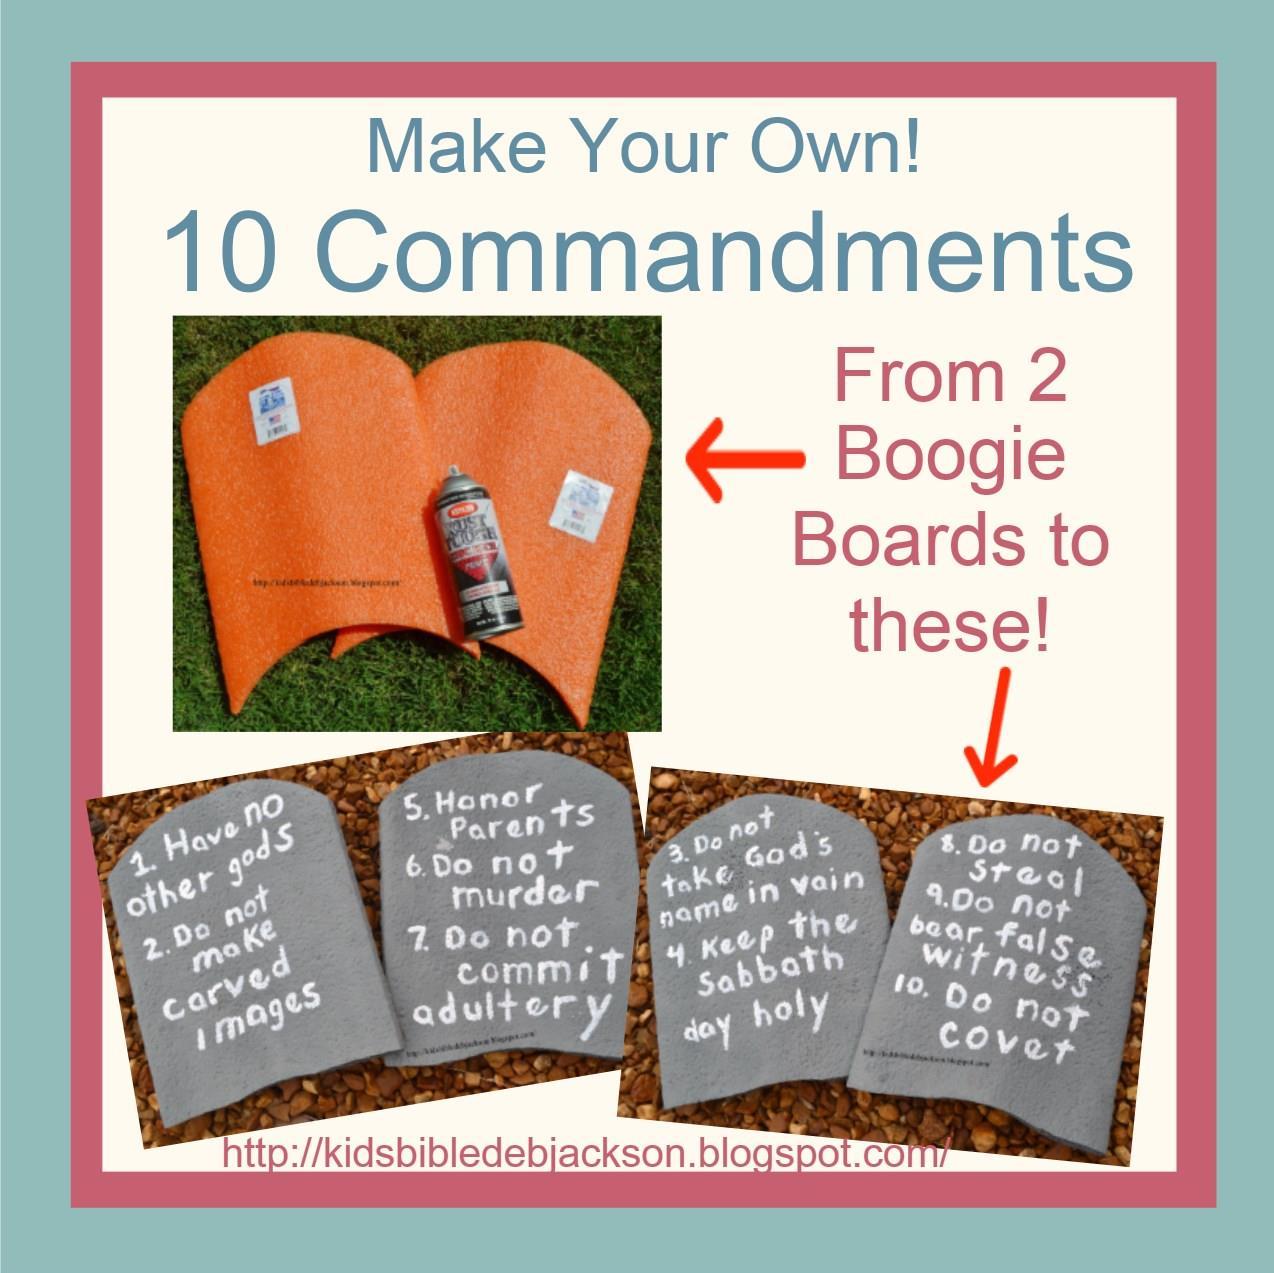 Make Your Own 10 Commandments Visual!